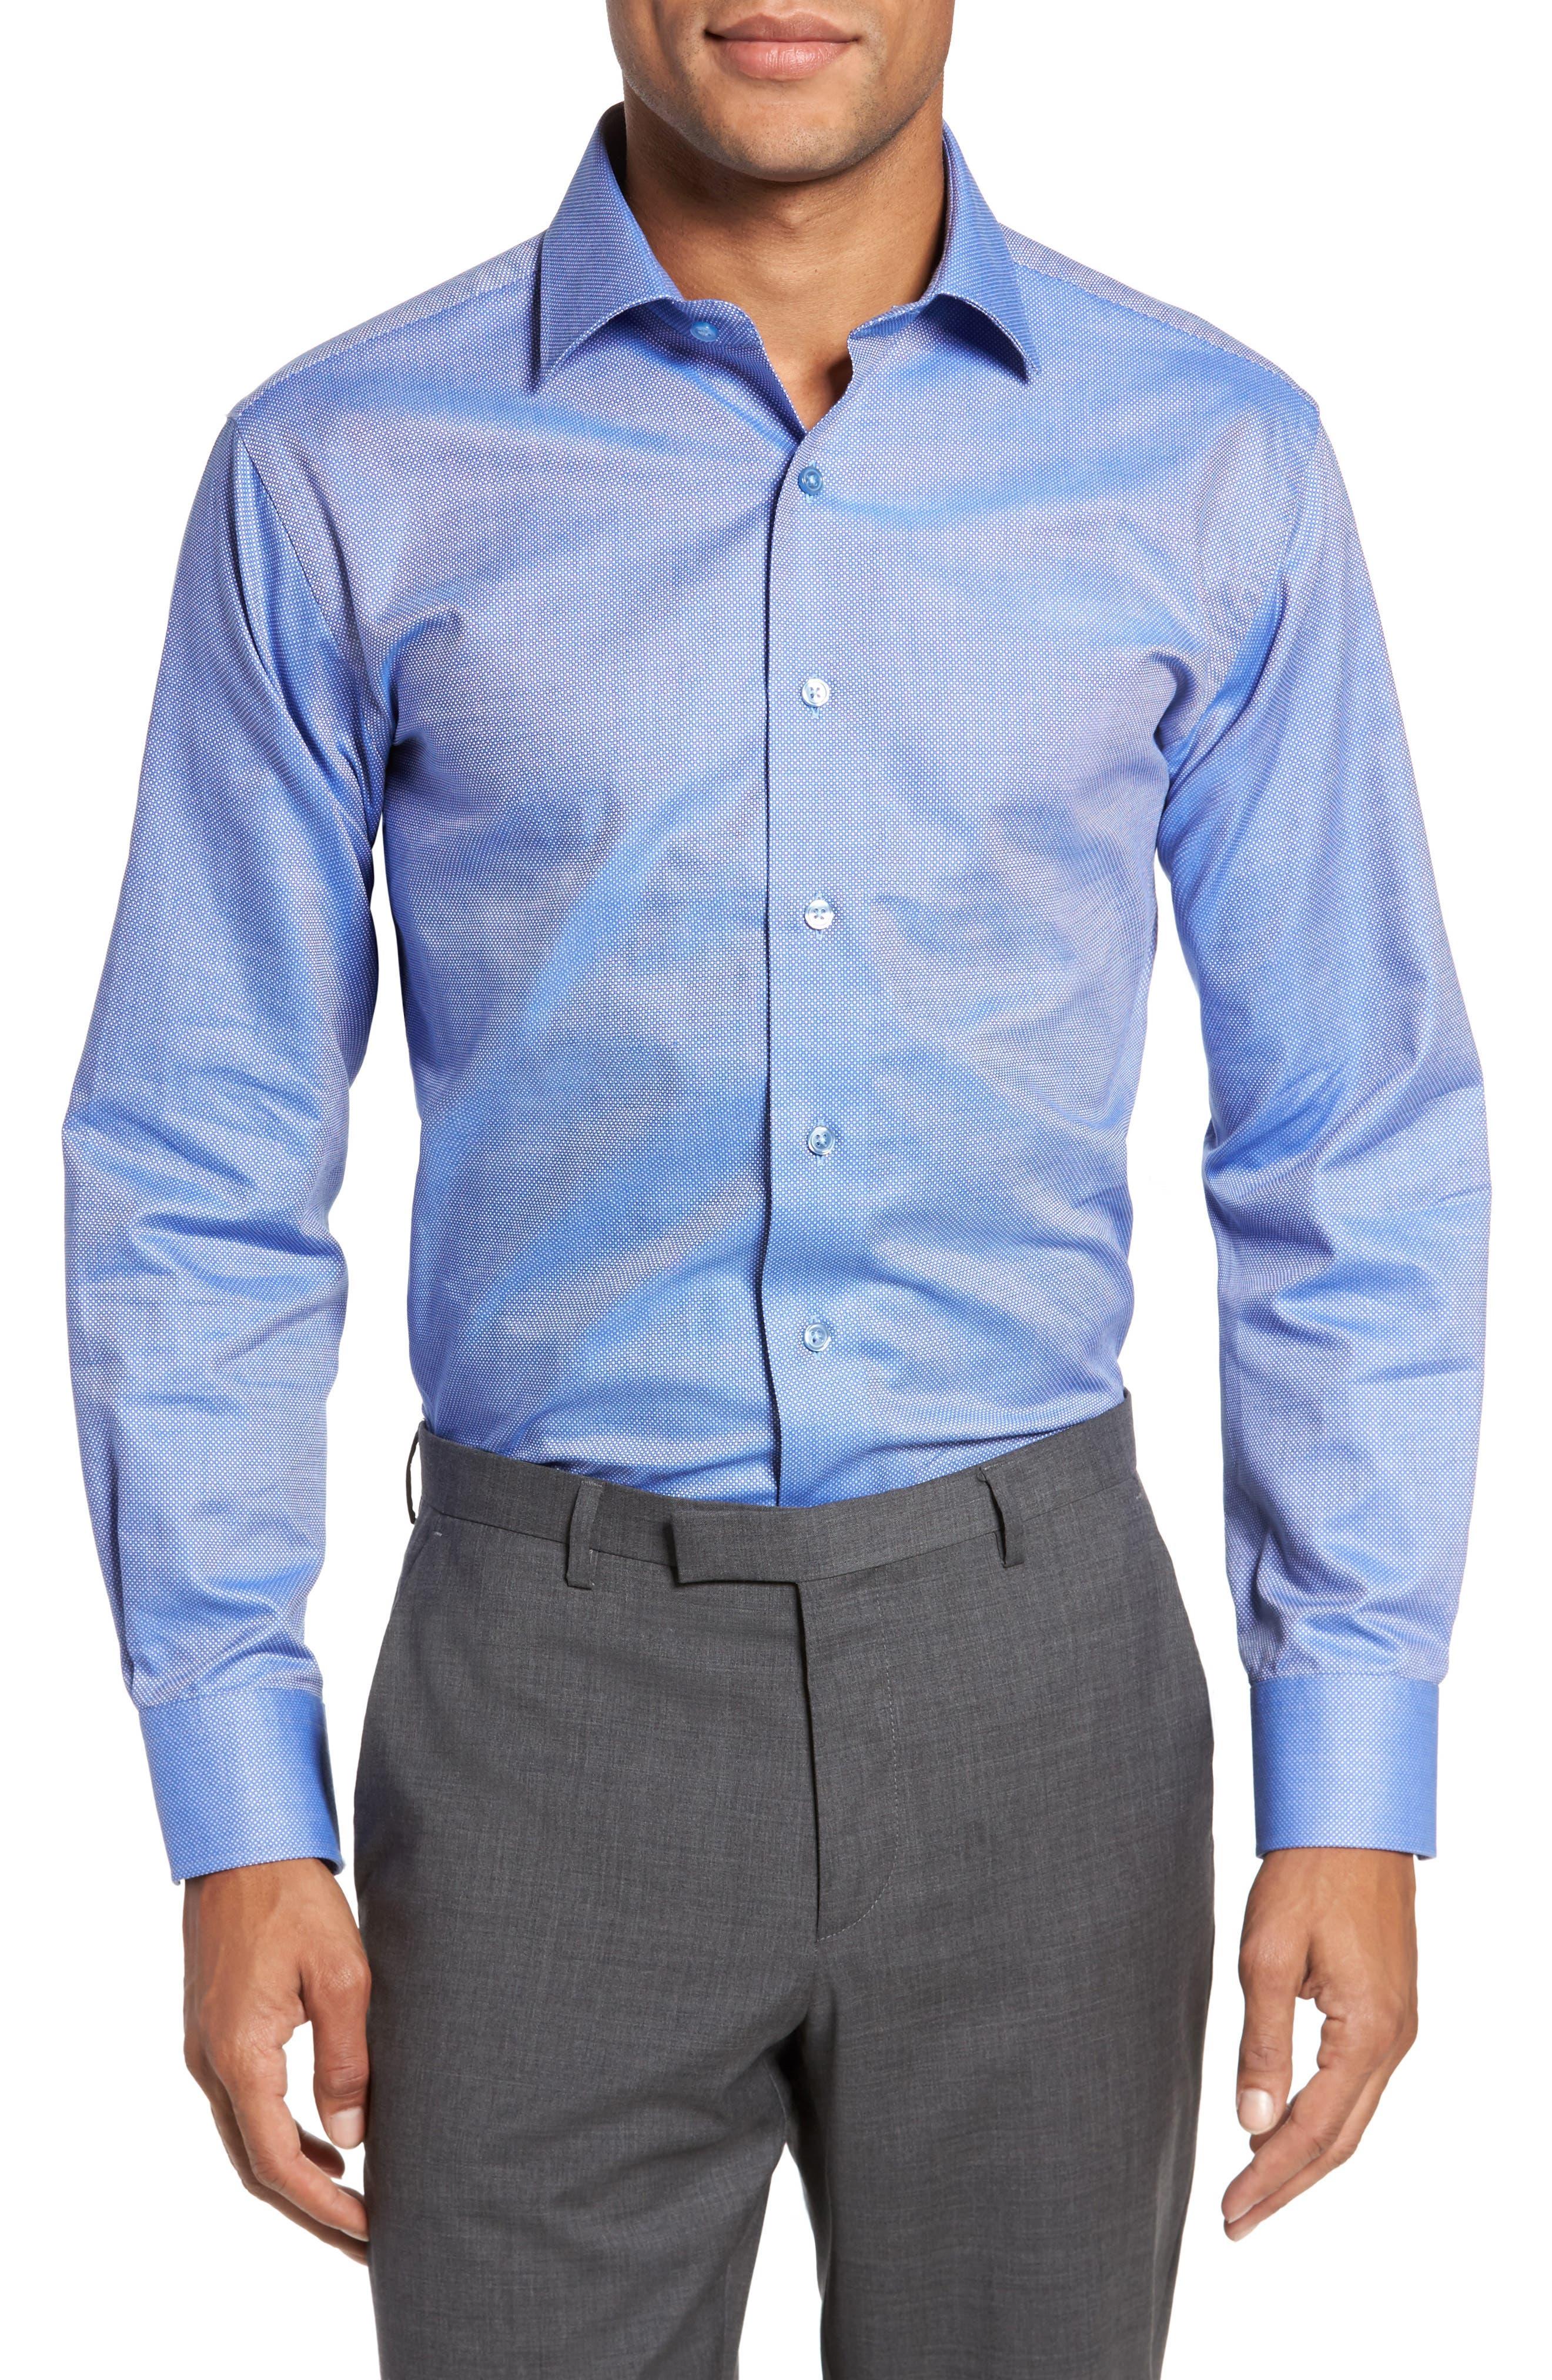 Trim Fit Textured Dress Shirt,                             Main thumbnail 1, color,                             NAVY